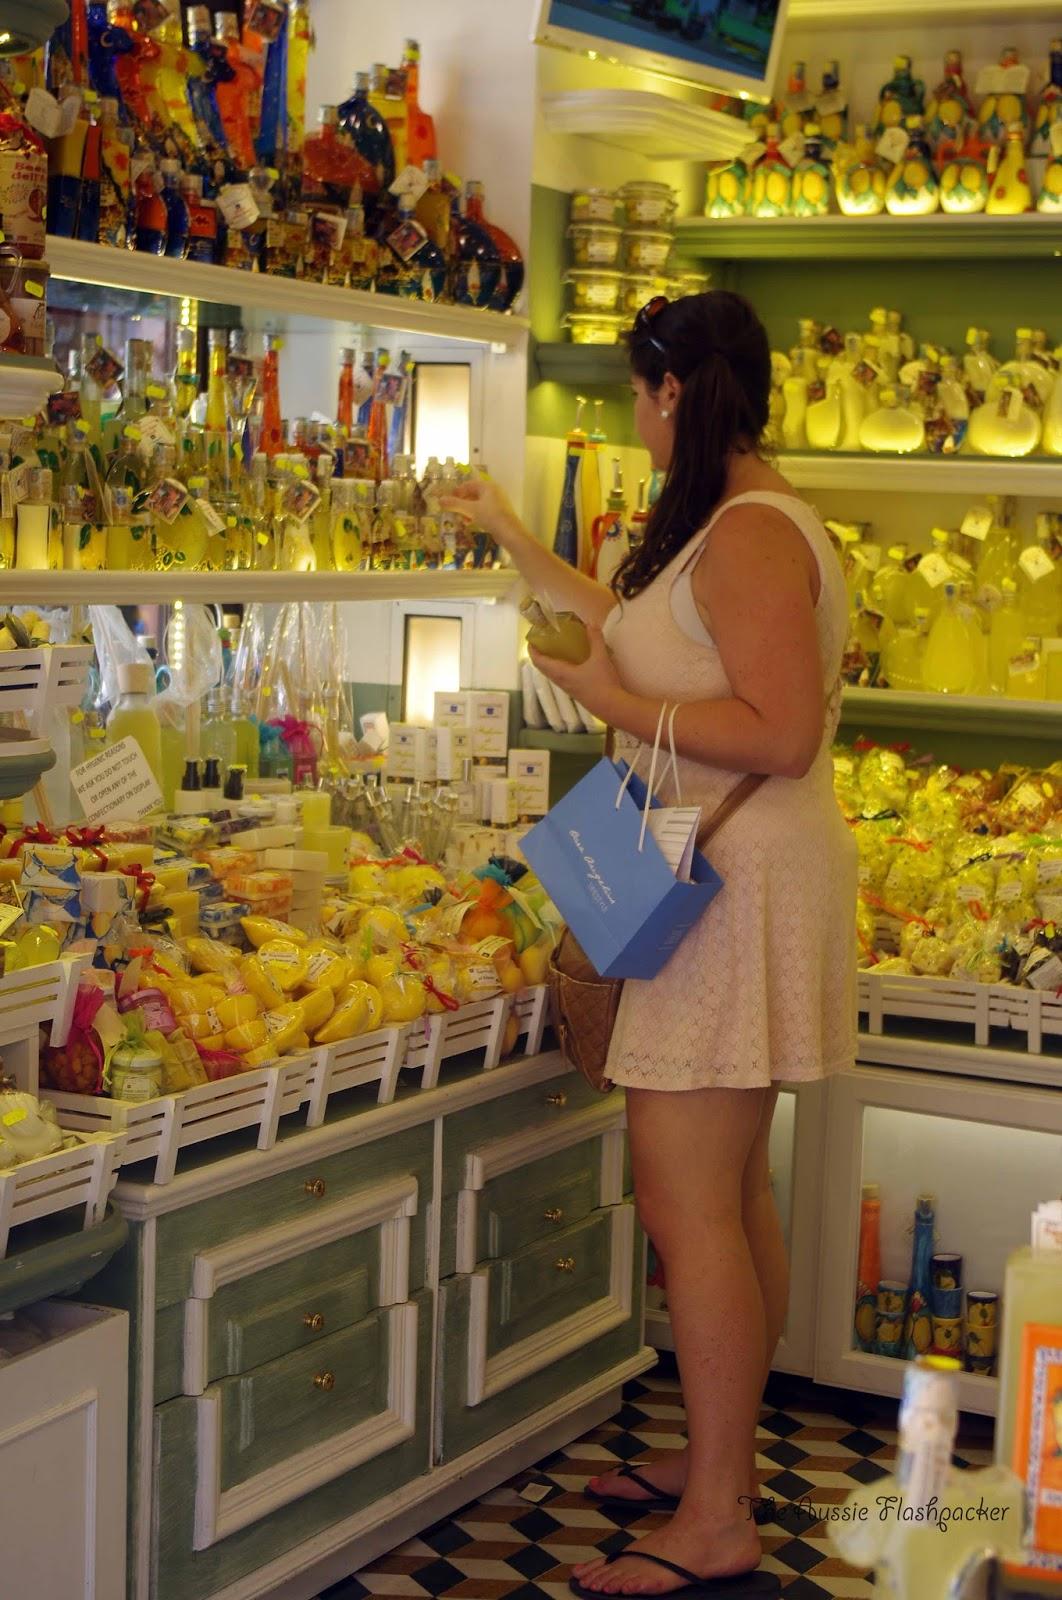 Girl shopping for Limoncello in Amalfi